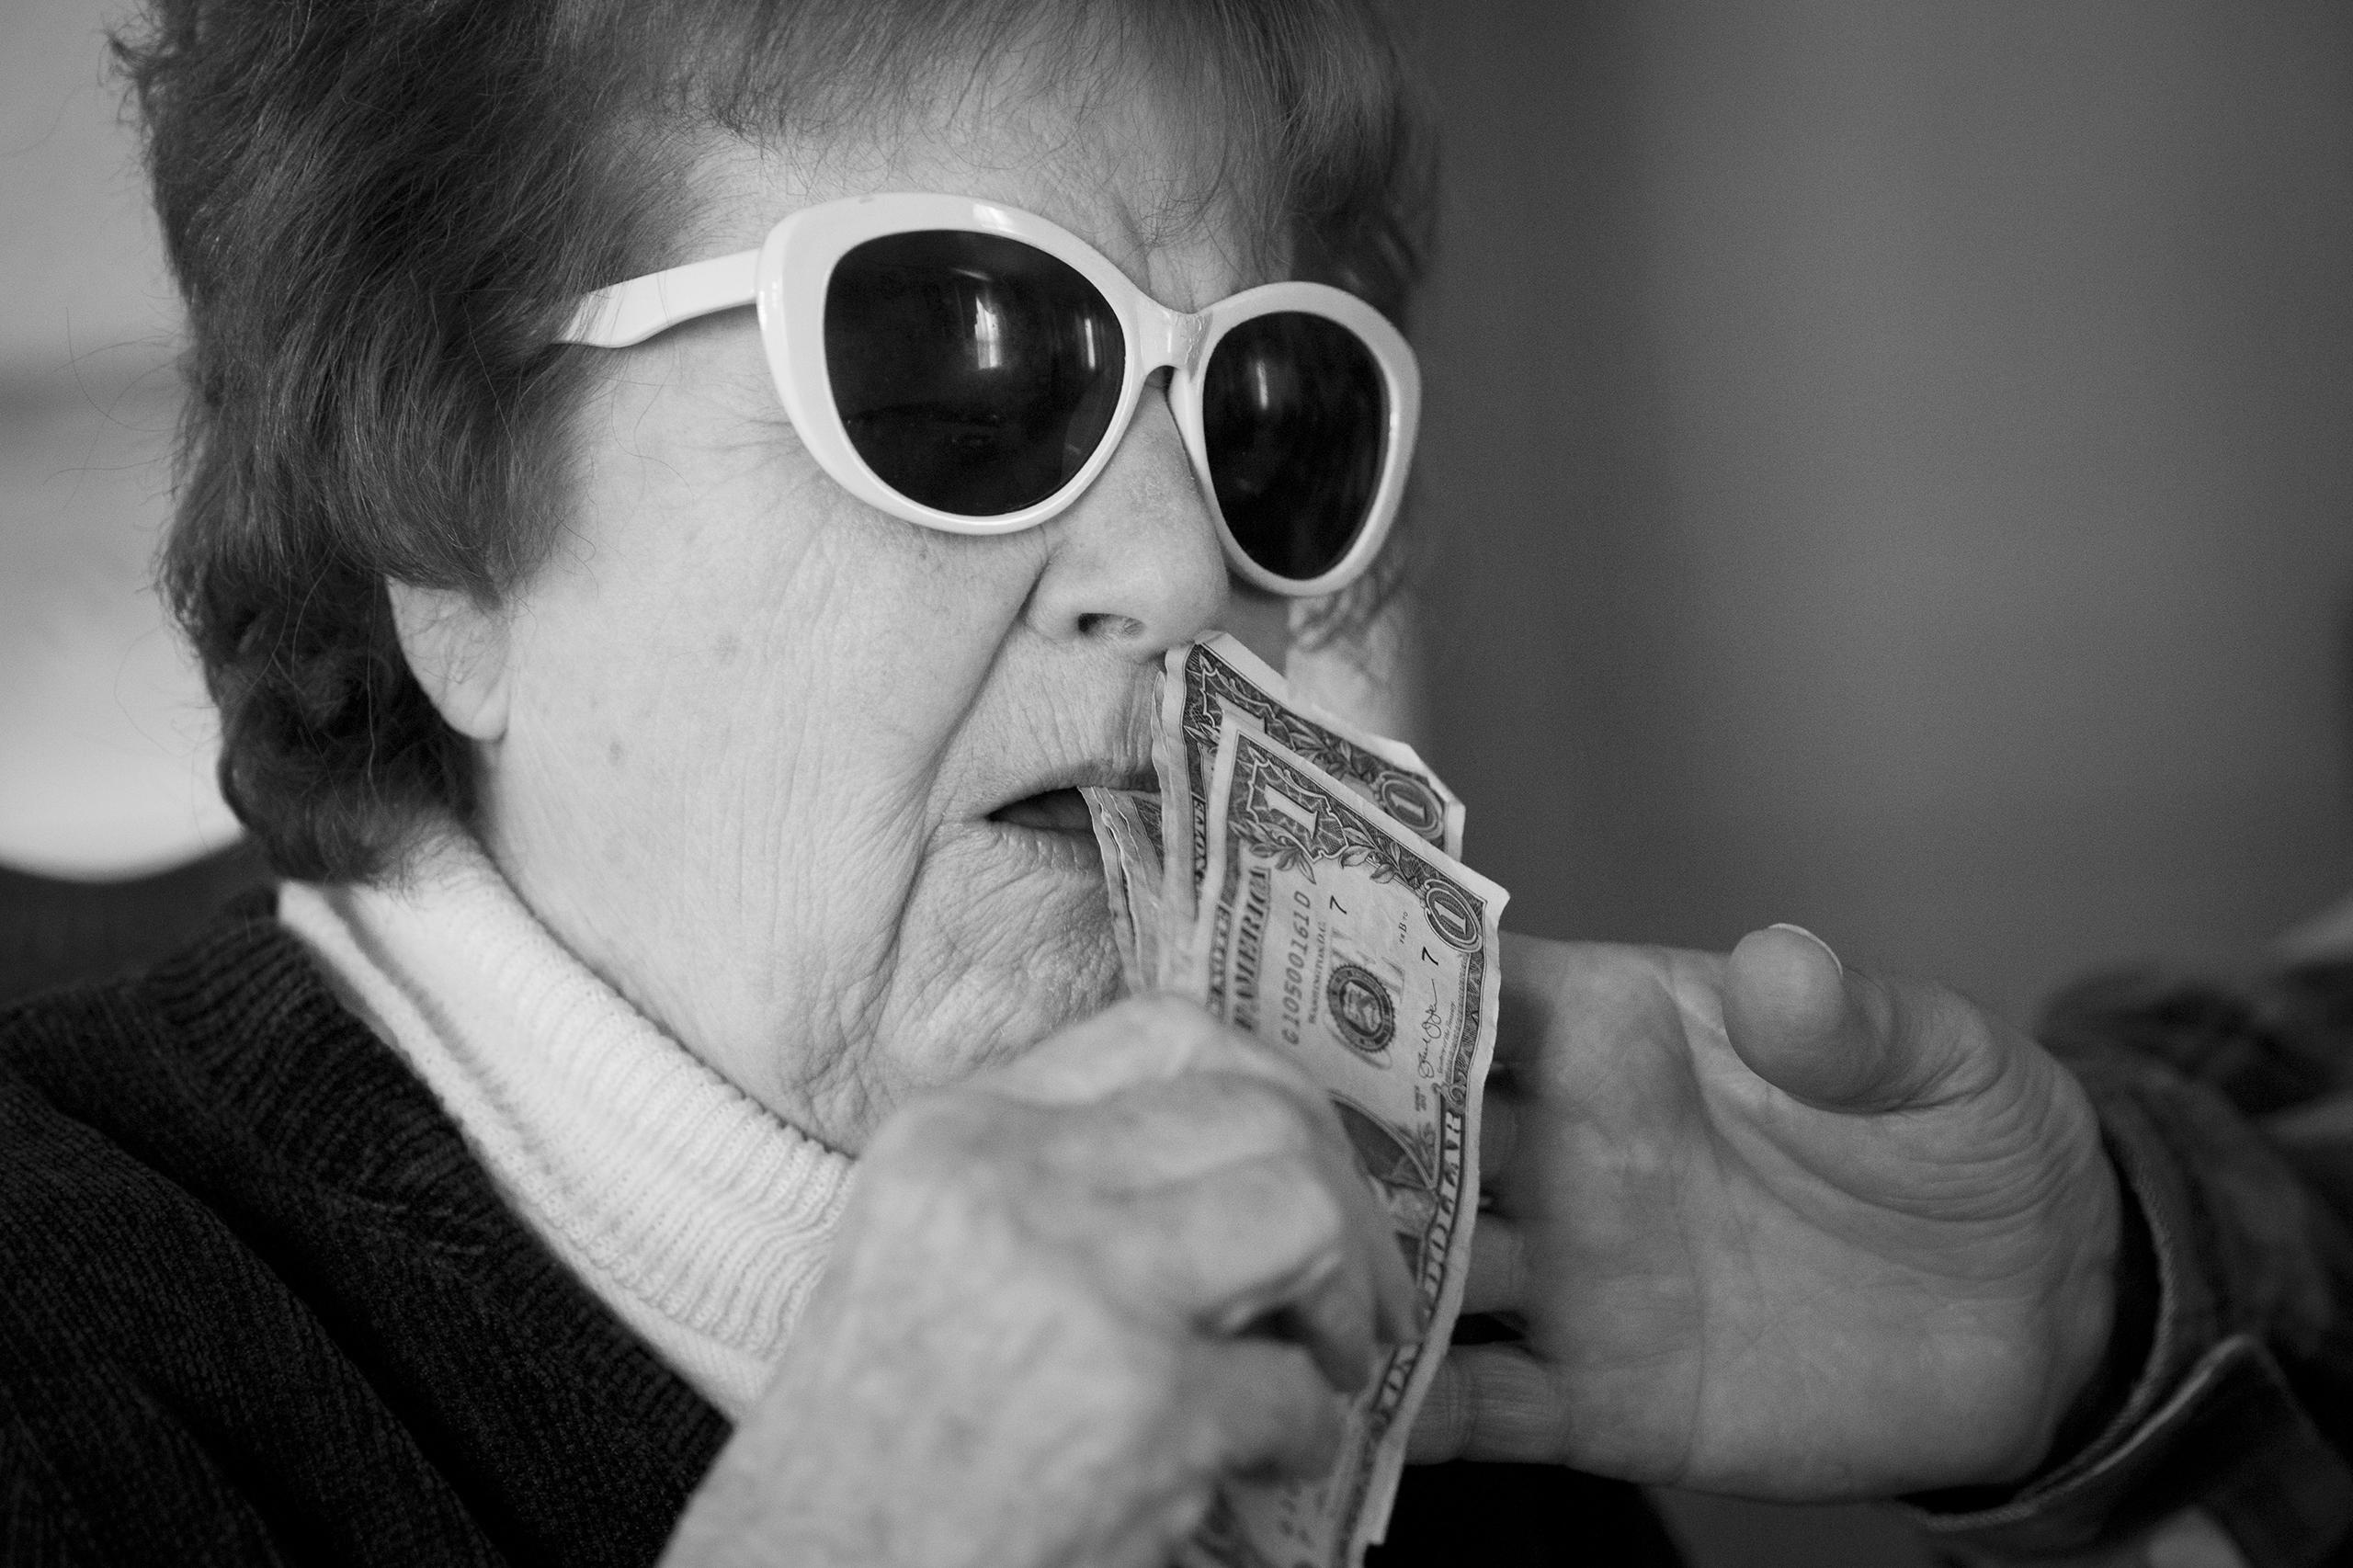 Karen wears sunglasses and tries to eat a handful of money, Ed intercepts